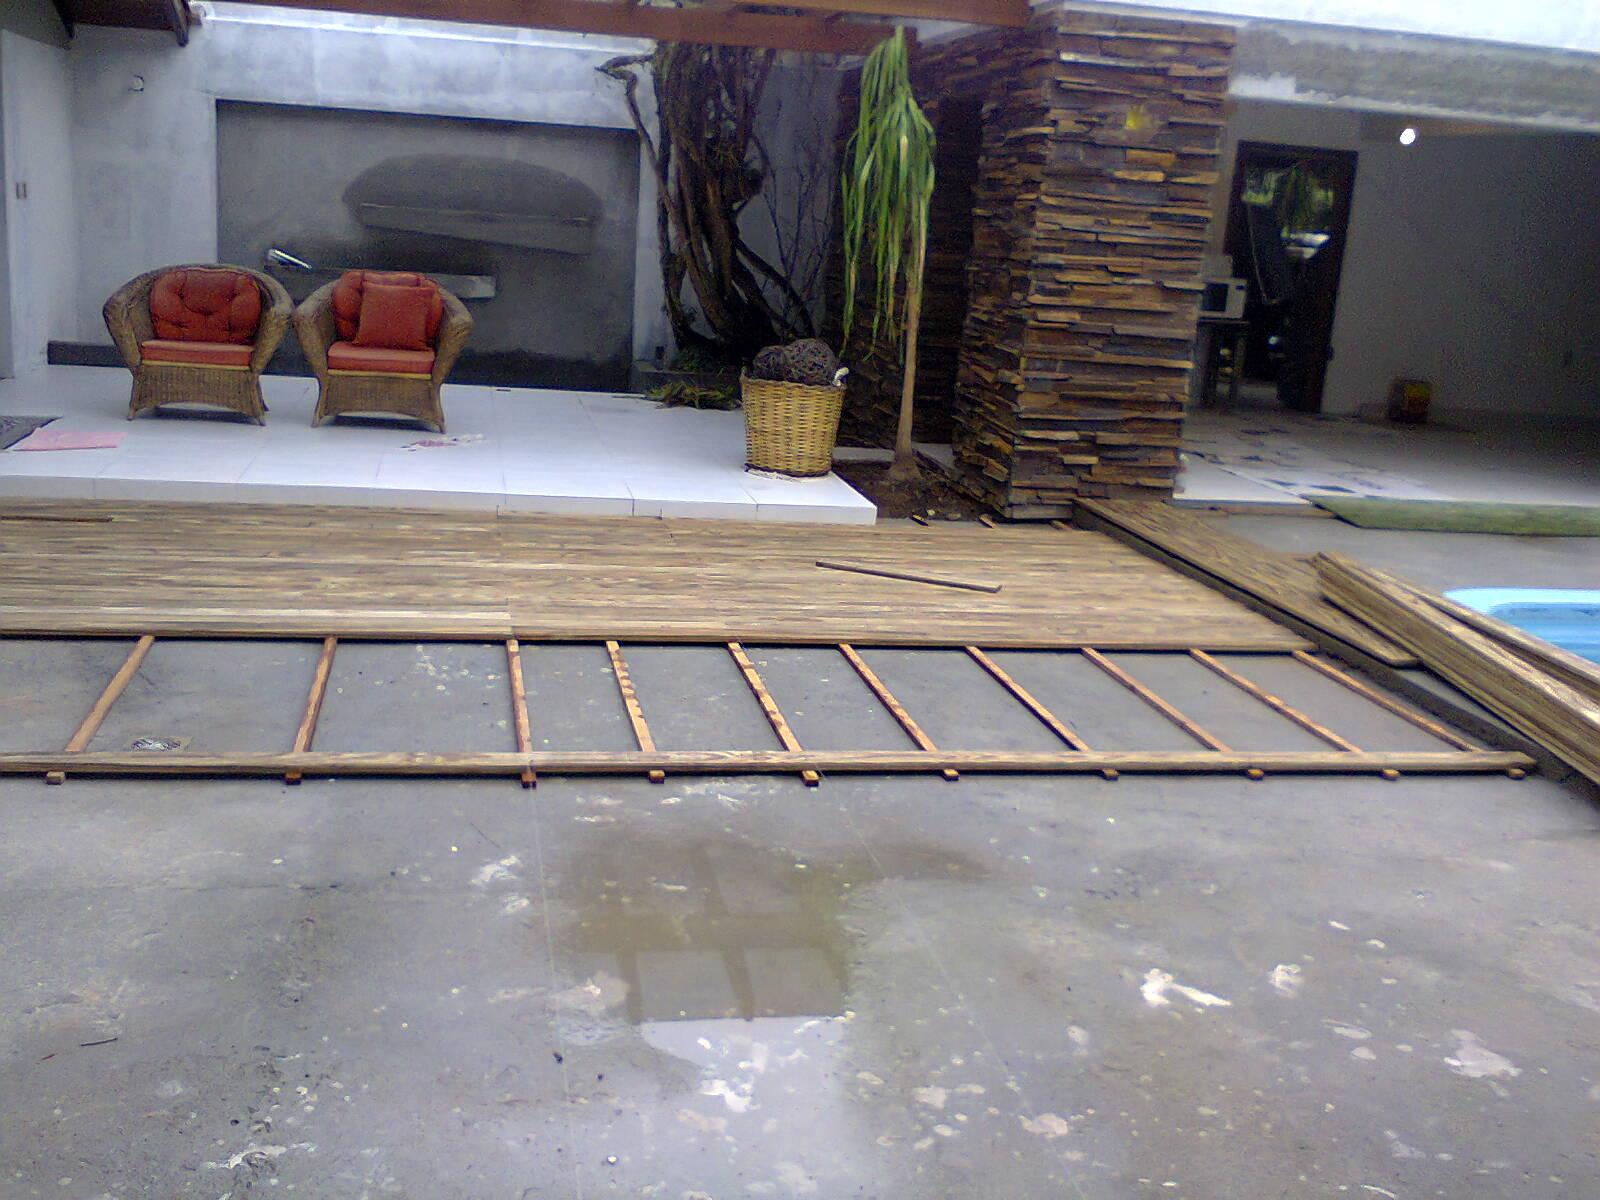 Wanderley branga deck piscina for Motor para depuradora de piscina